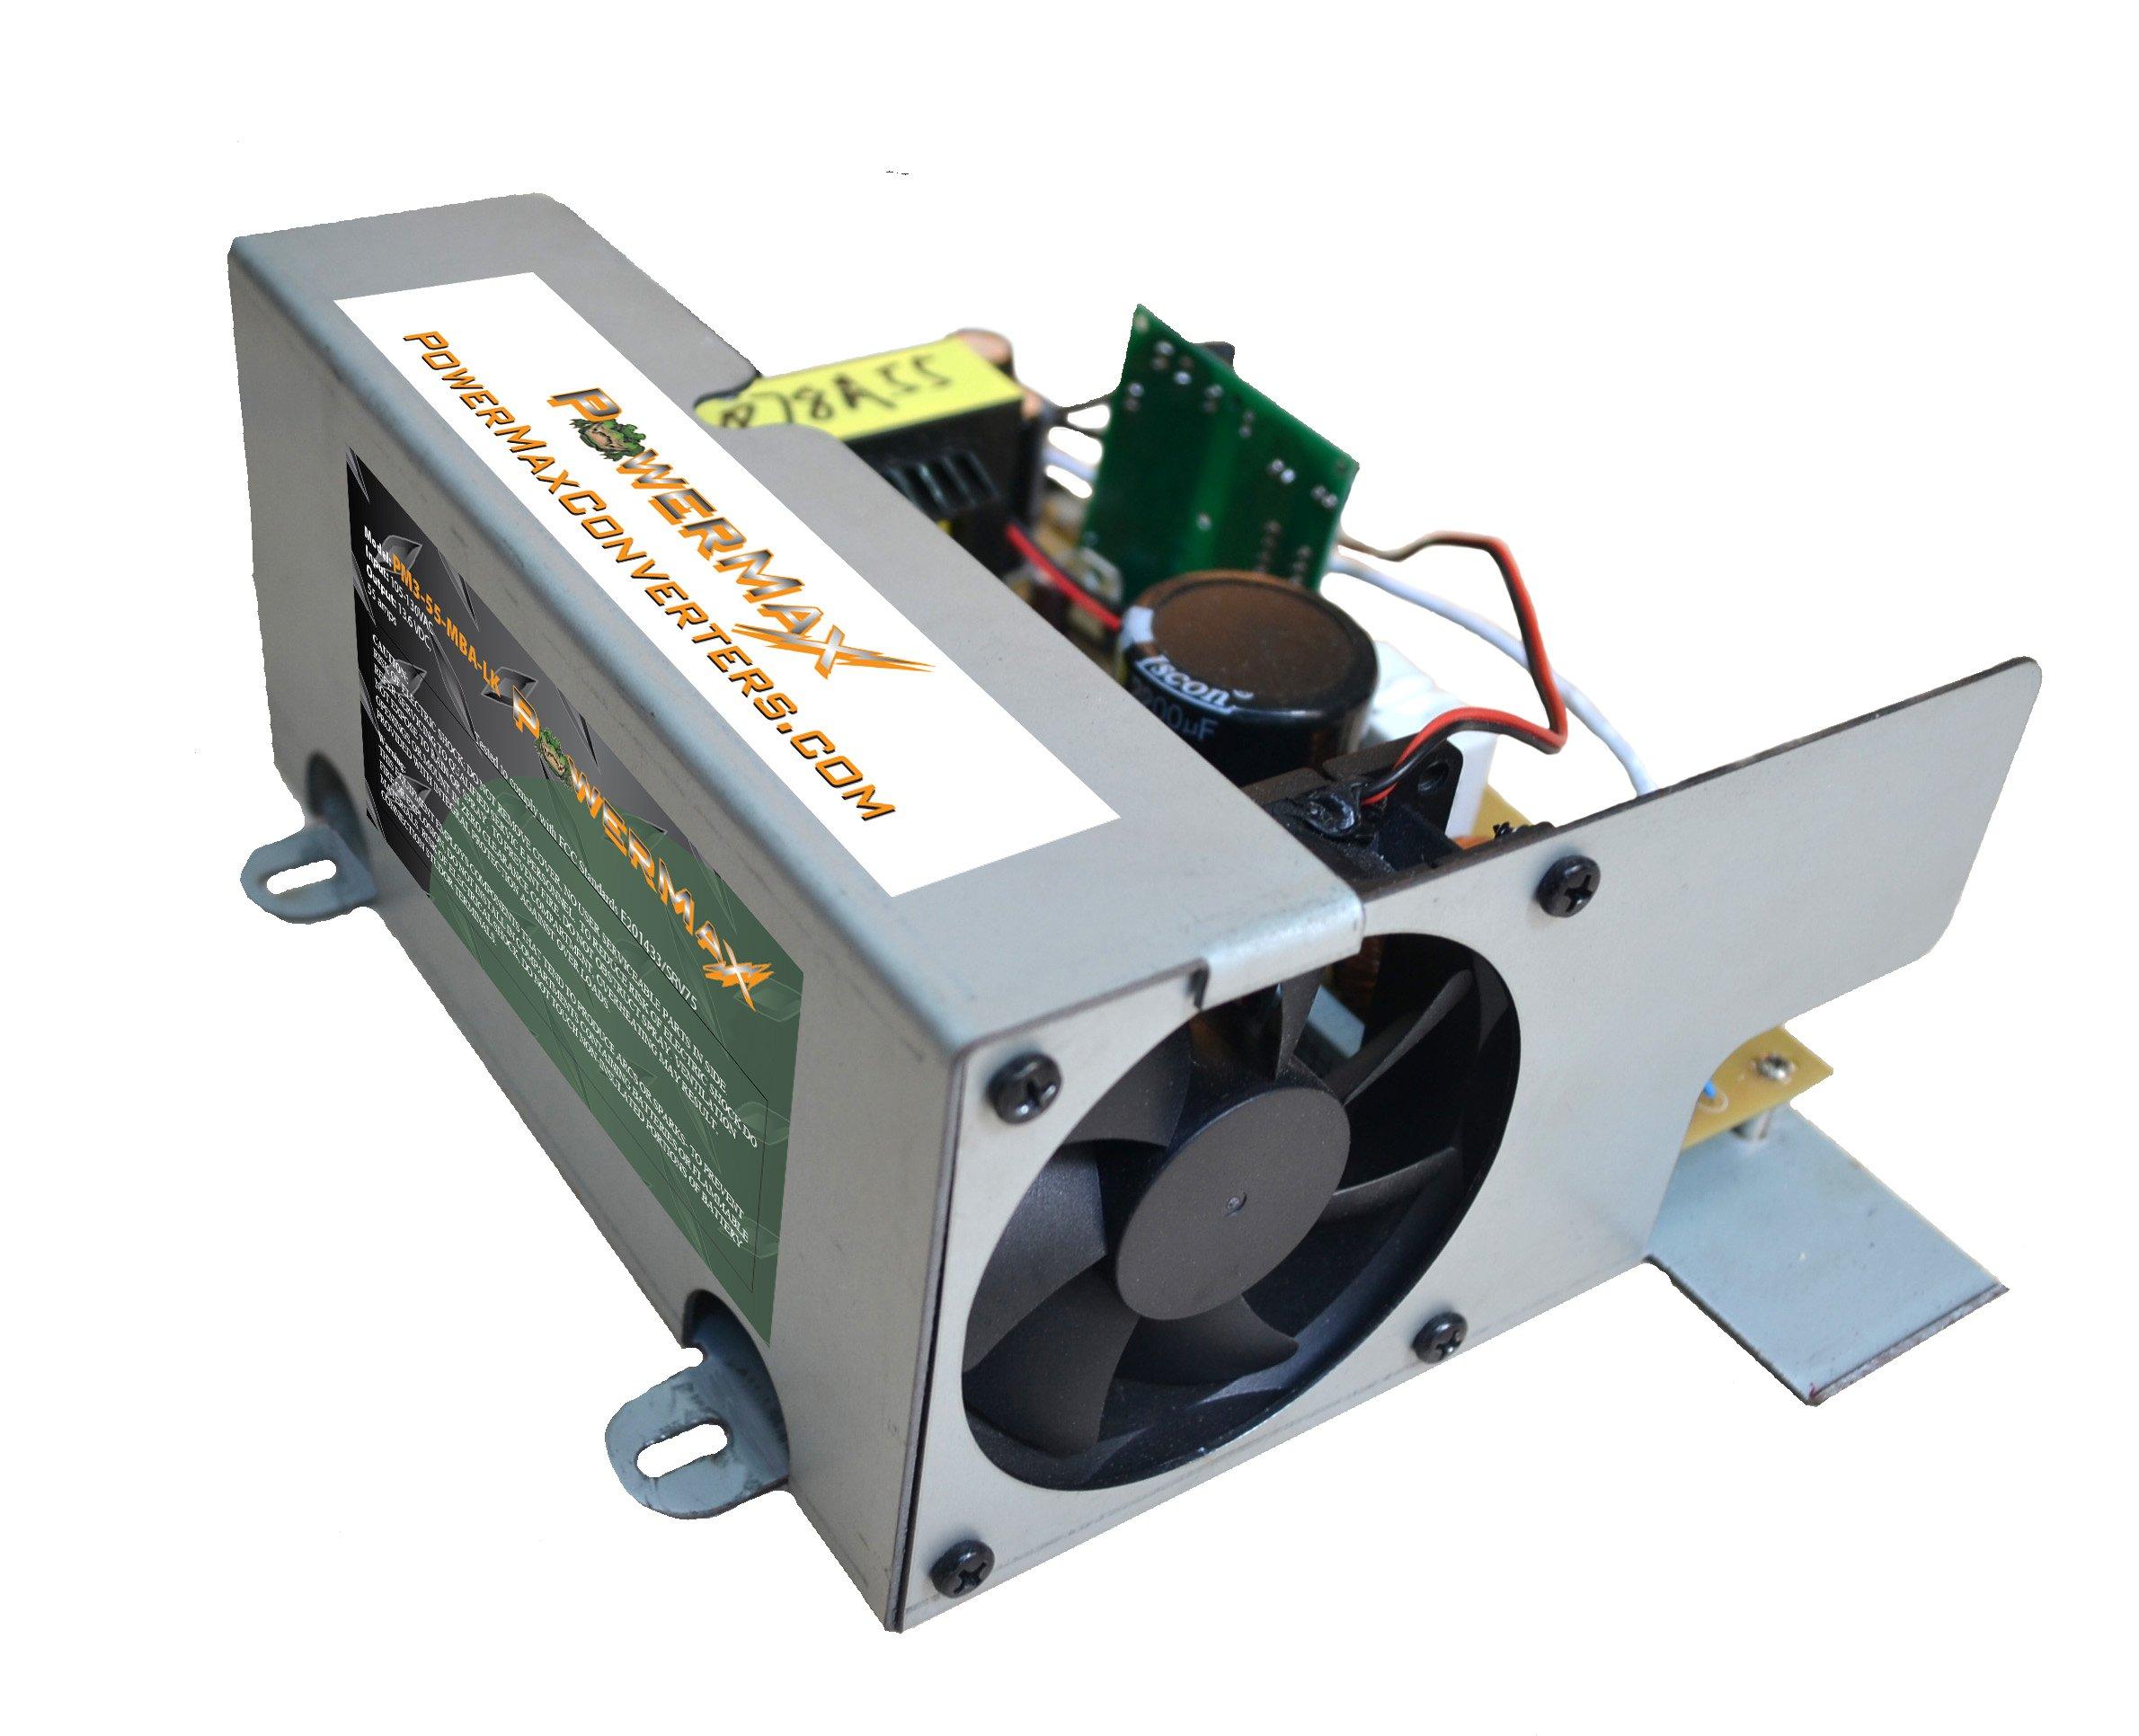 PowerMax PM4 55A MBA 55 Amp RV AC to DC Converter